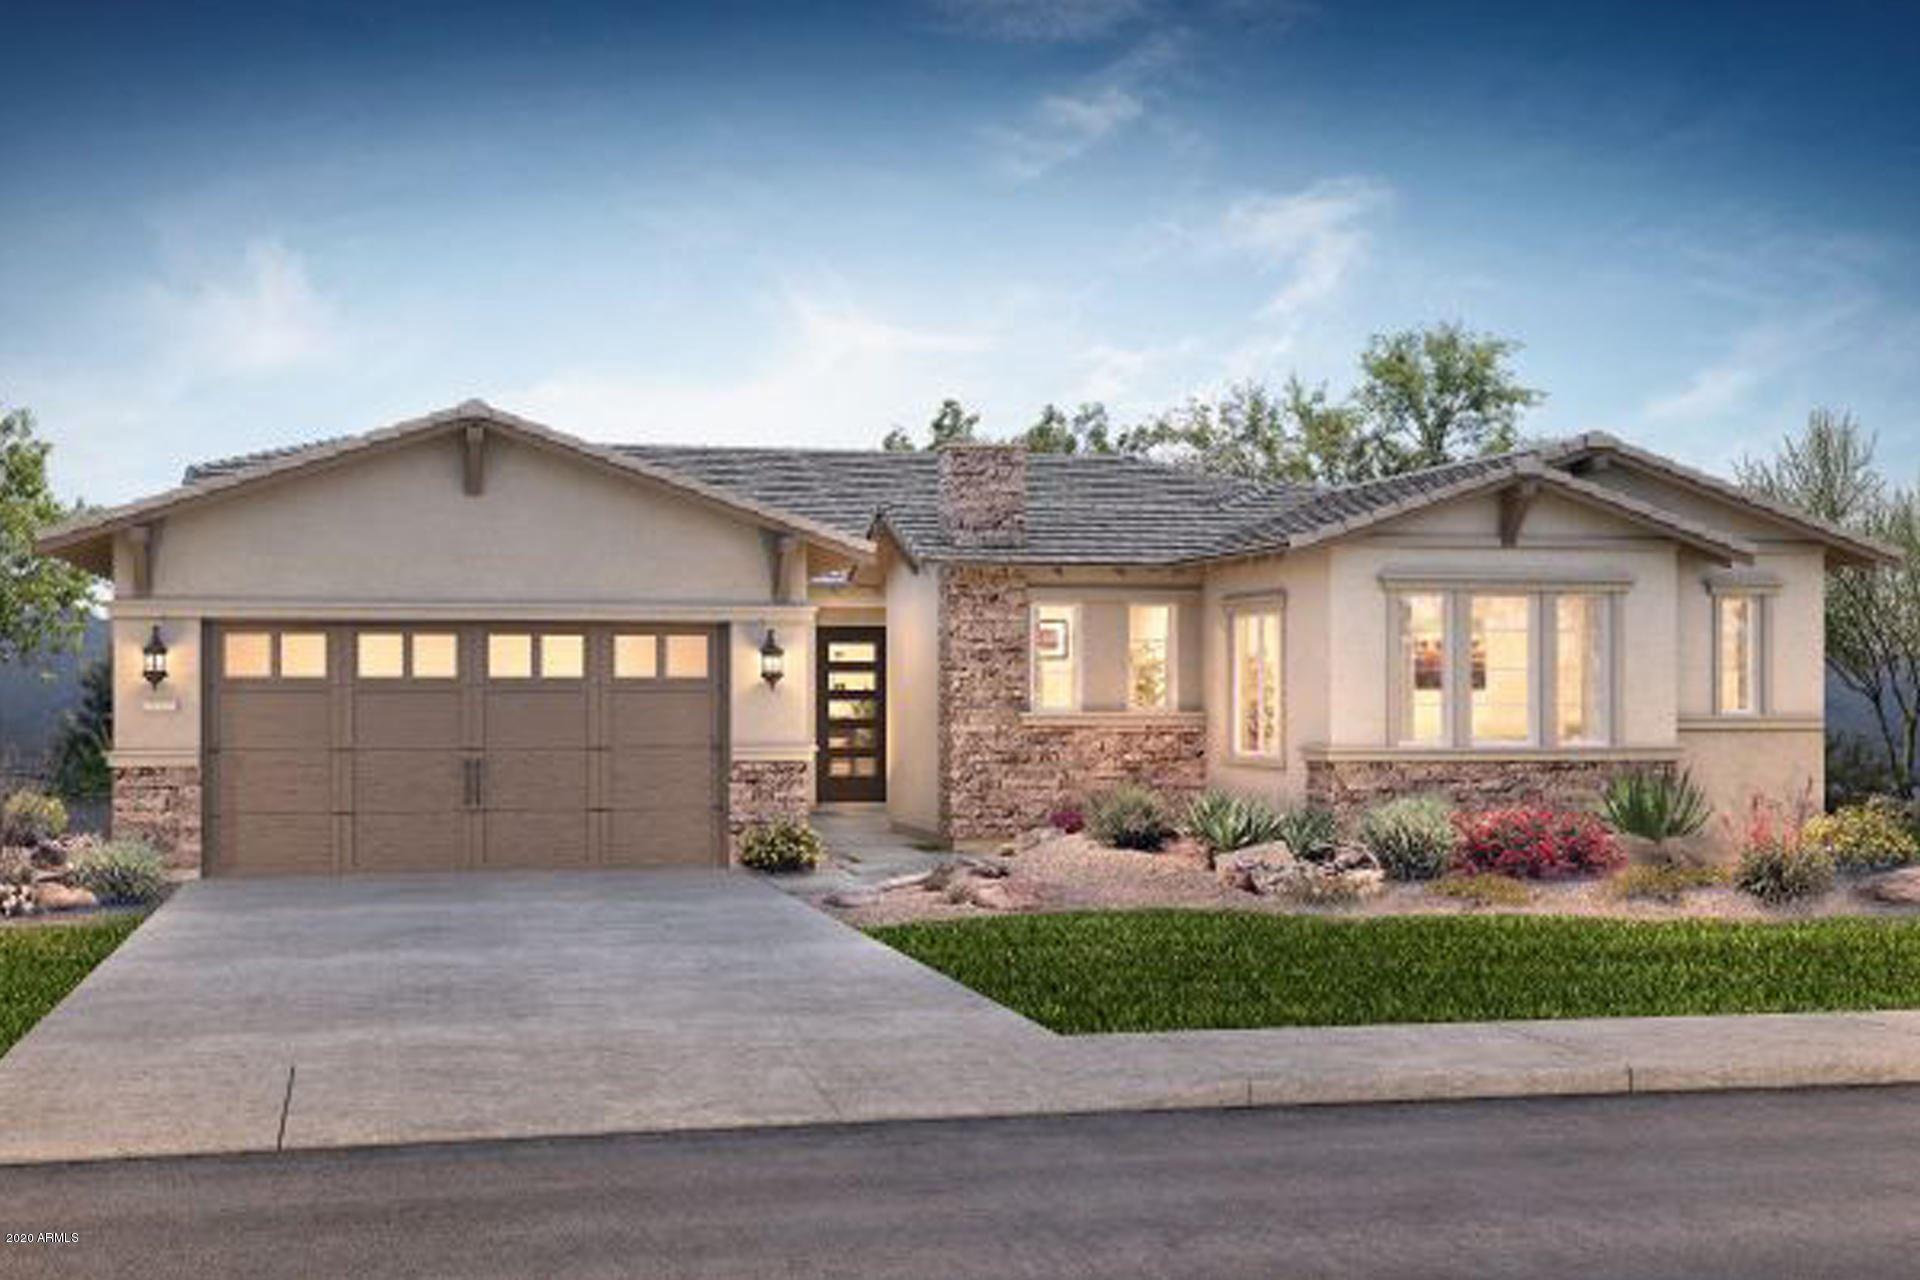 2340 E CHAMA Drive, Phoenix, AZ 85024 - MLS#: 6074427